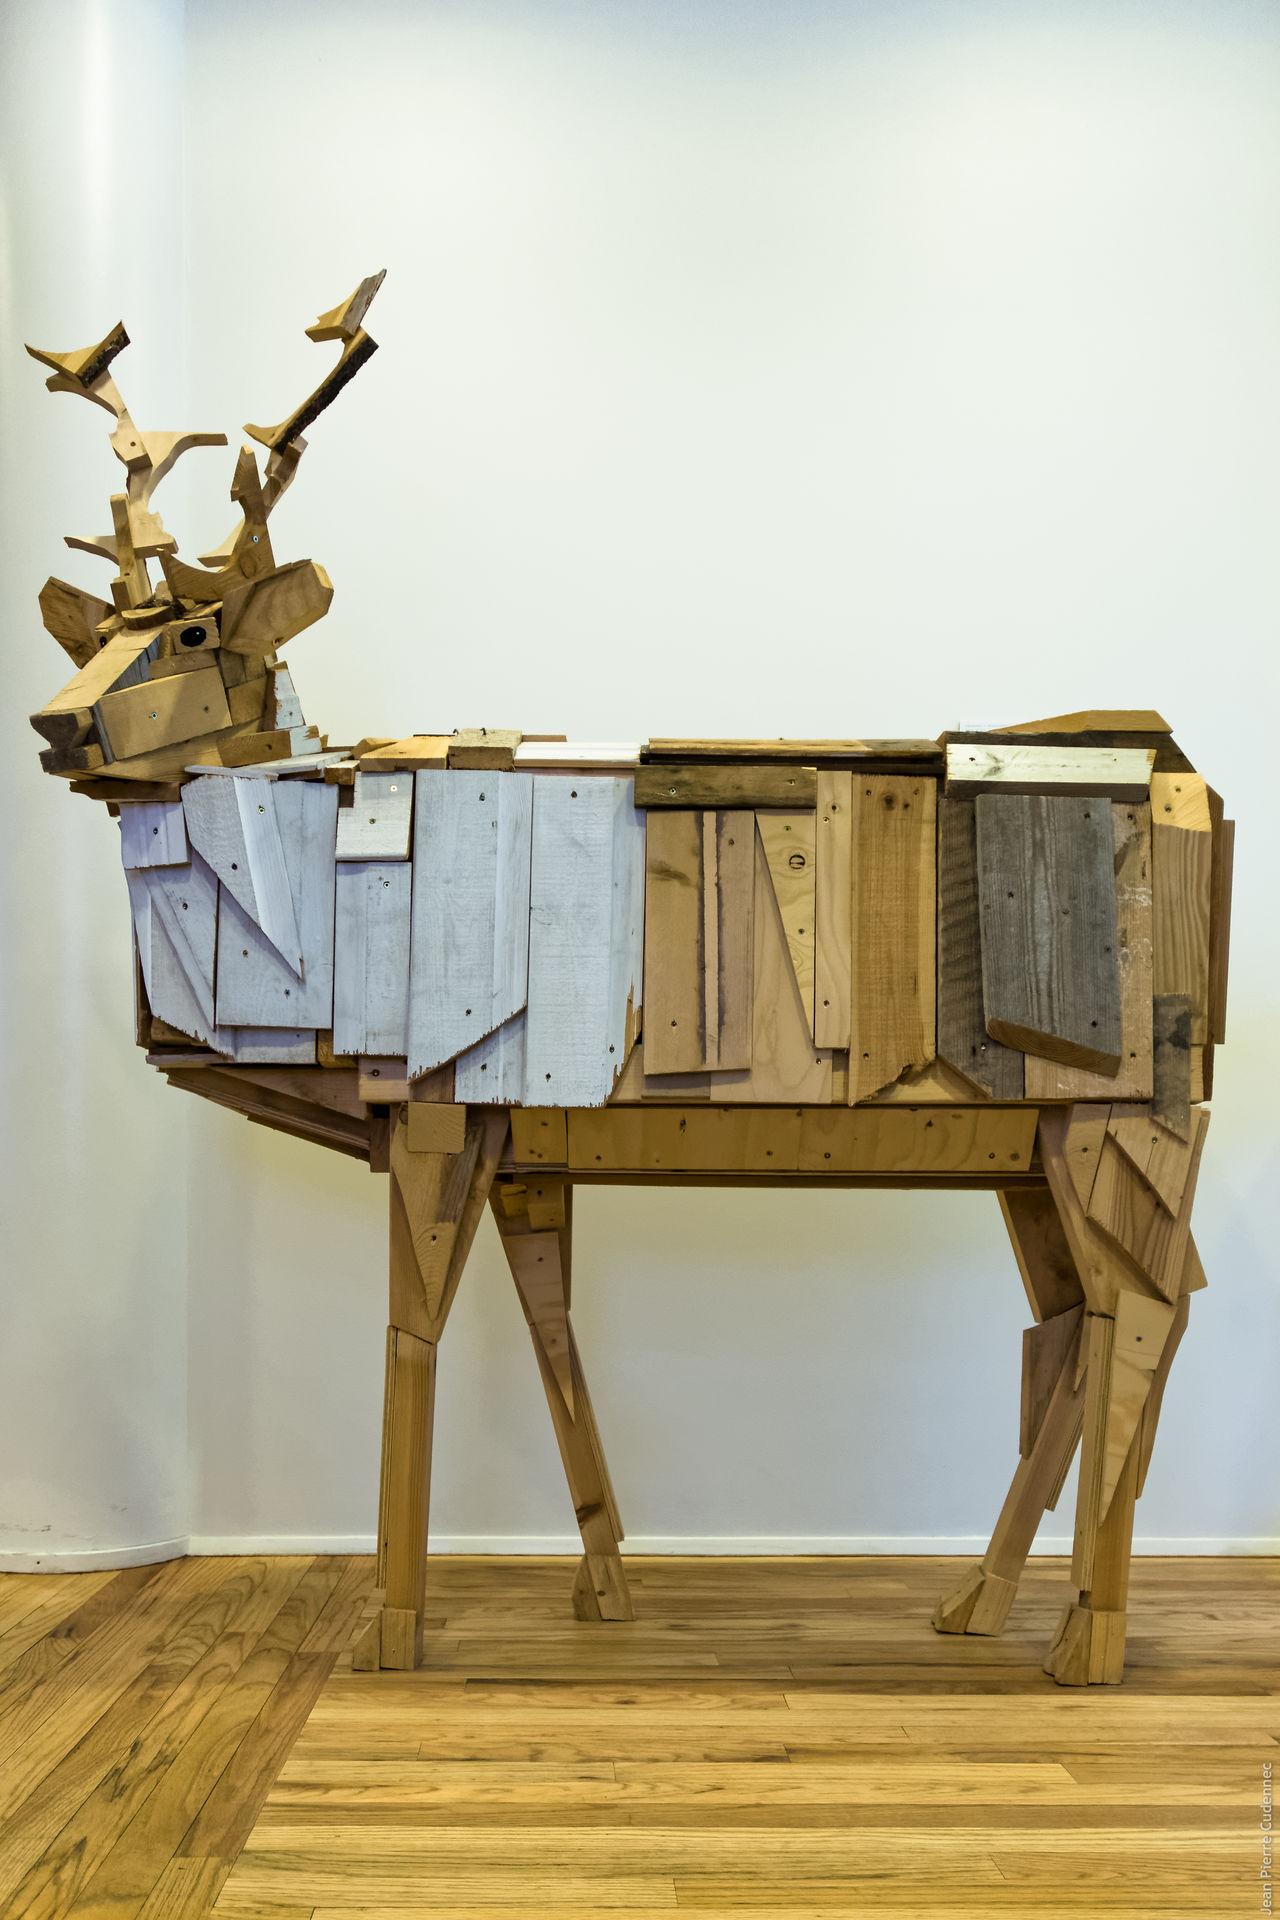 Egilsstaðir, sculpture d'Aðalheiður S. Eysteinsdóttir Art Iceland Iceland_collection Islande Sculpture Wood - Material Wooden Reindeer